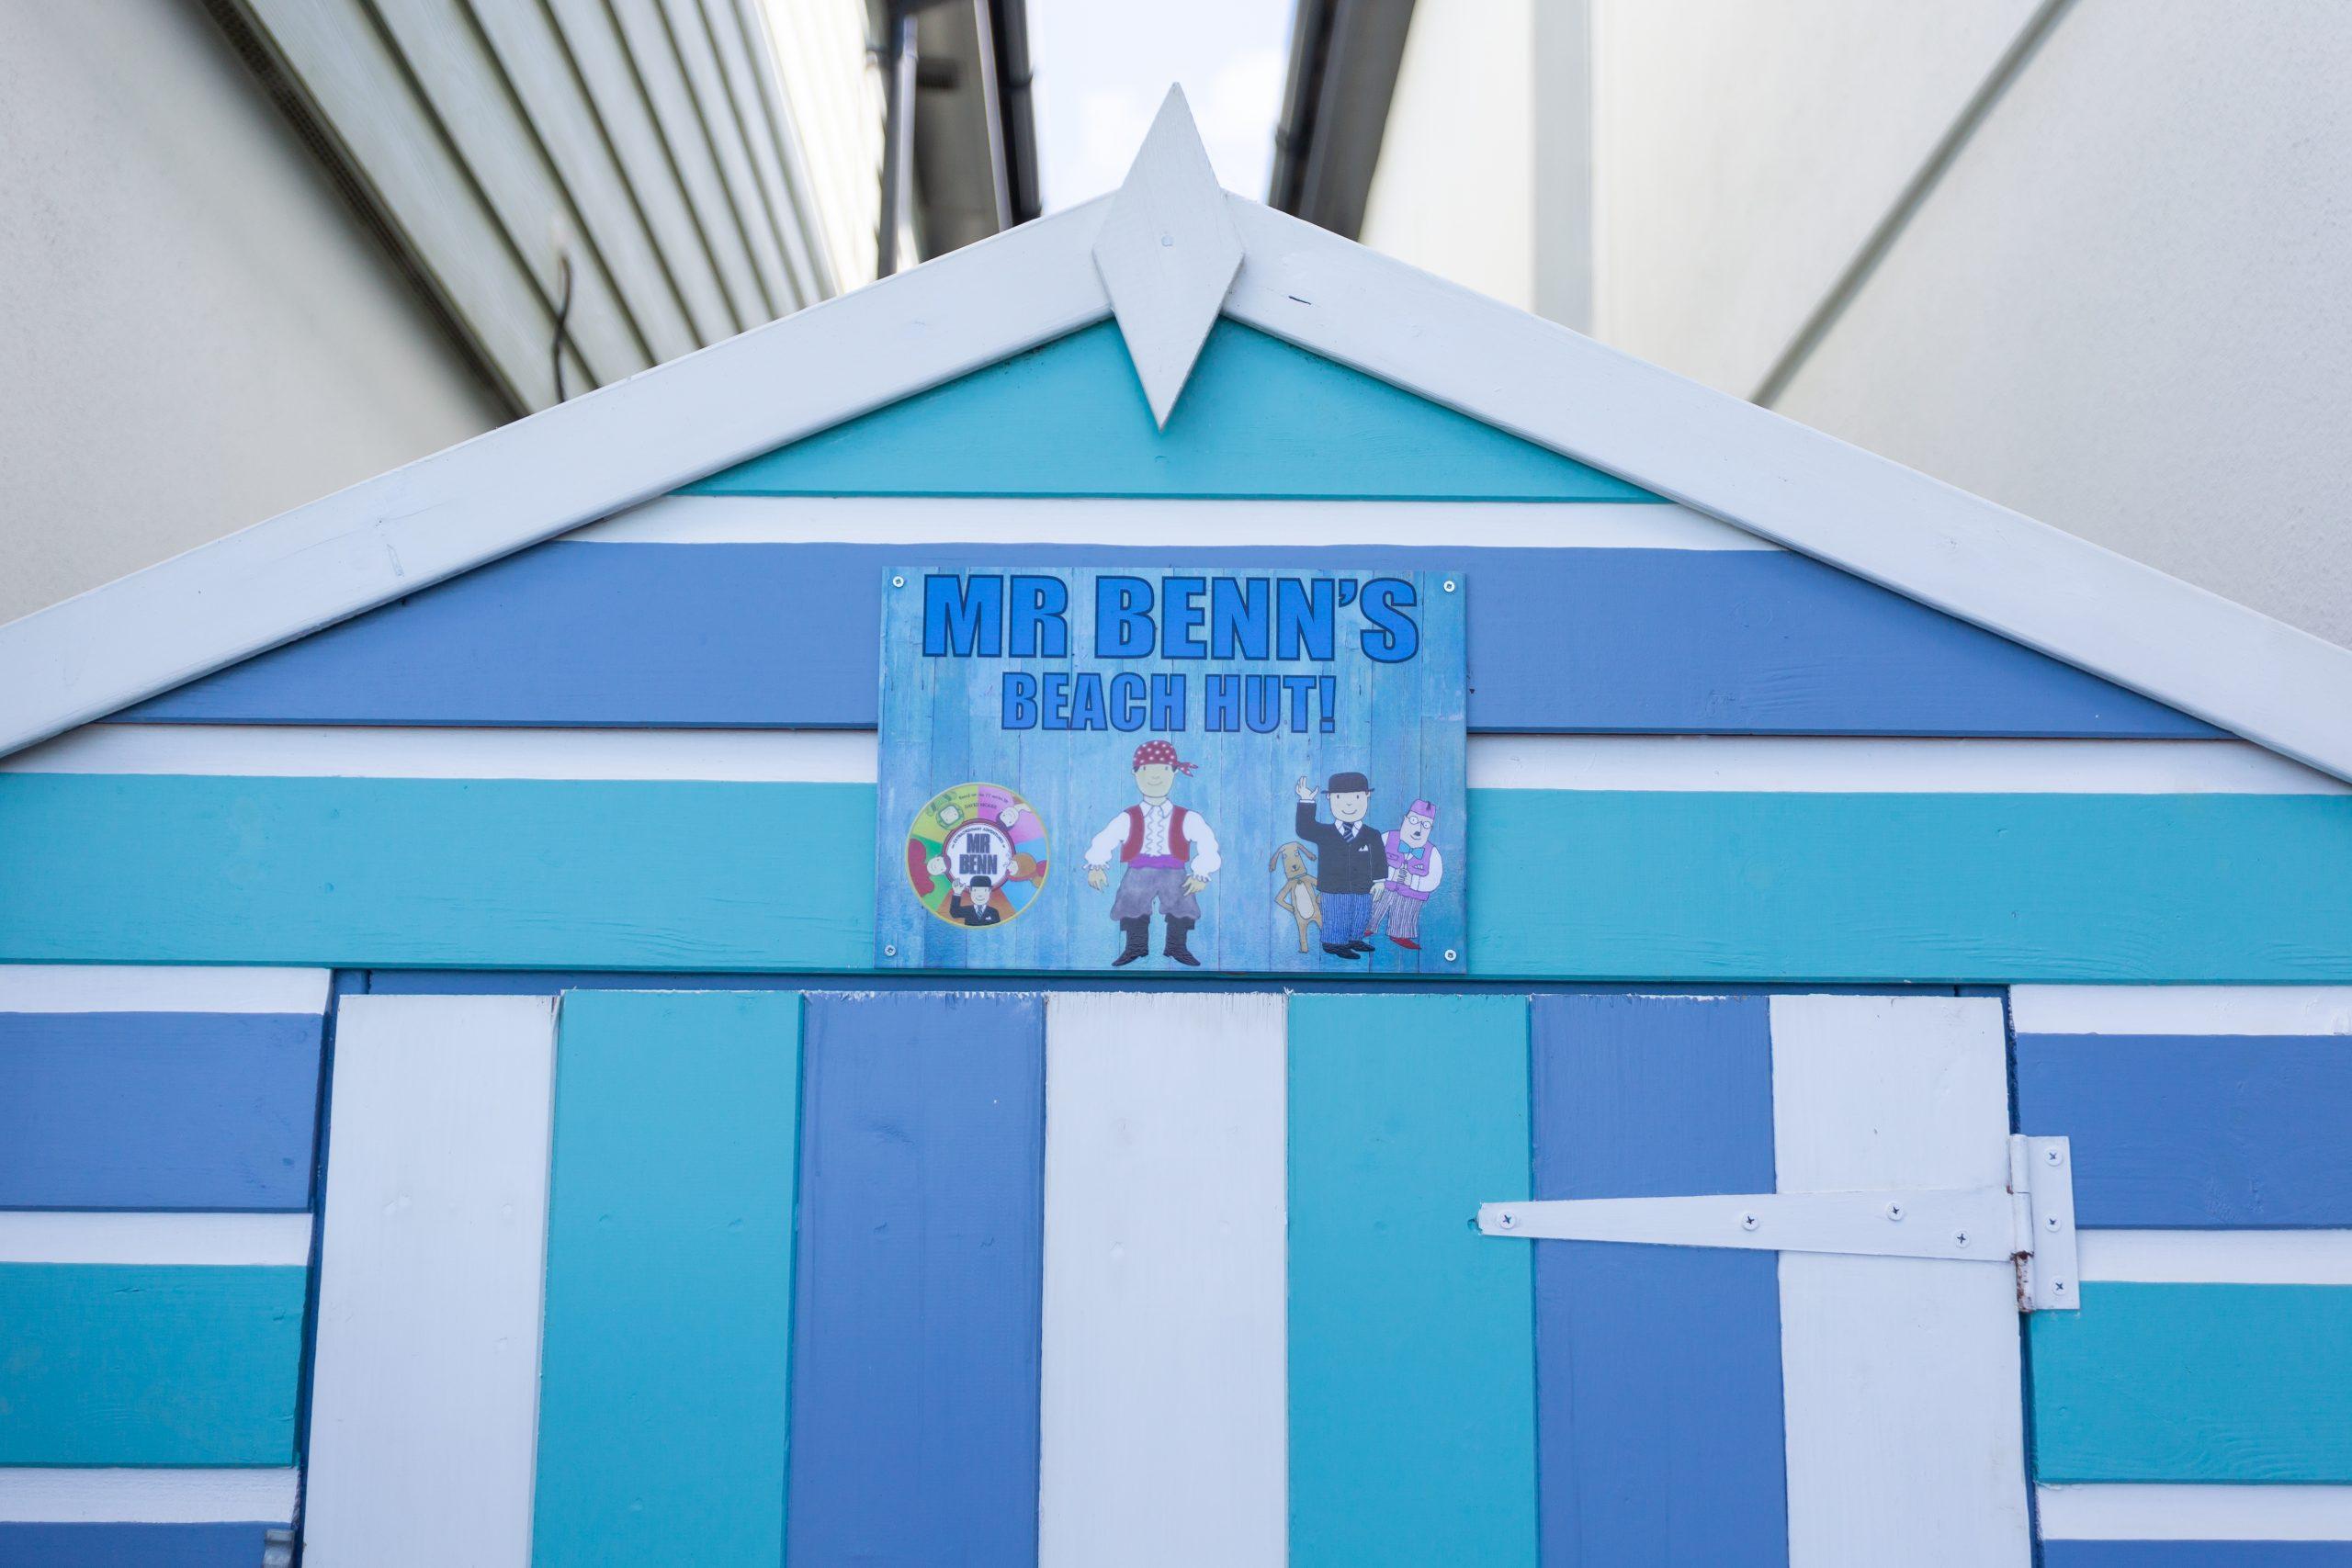 Mr Benn's Beach Hut at One Atlantic Watch